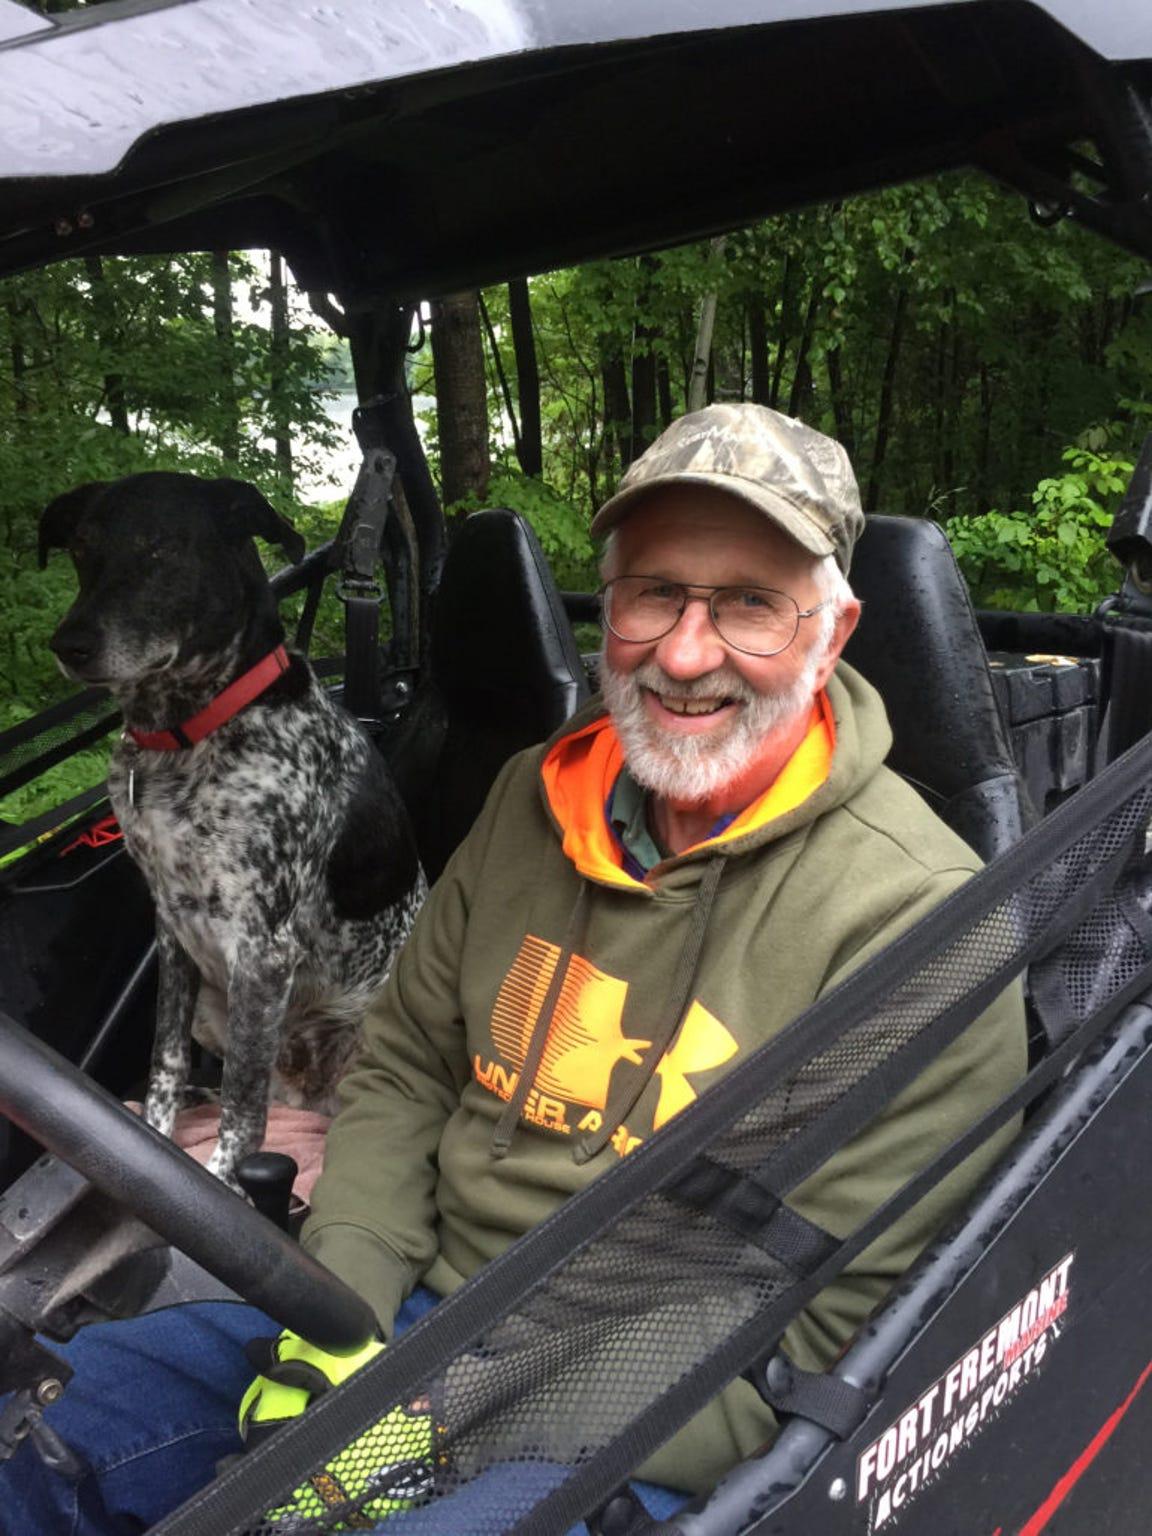 Yogi Antoniewicz along with his dog, Jaeger, enjoys